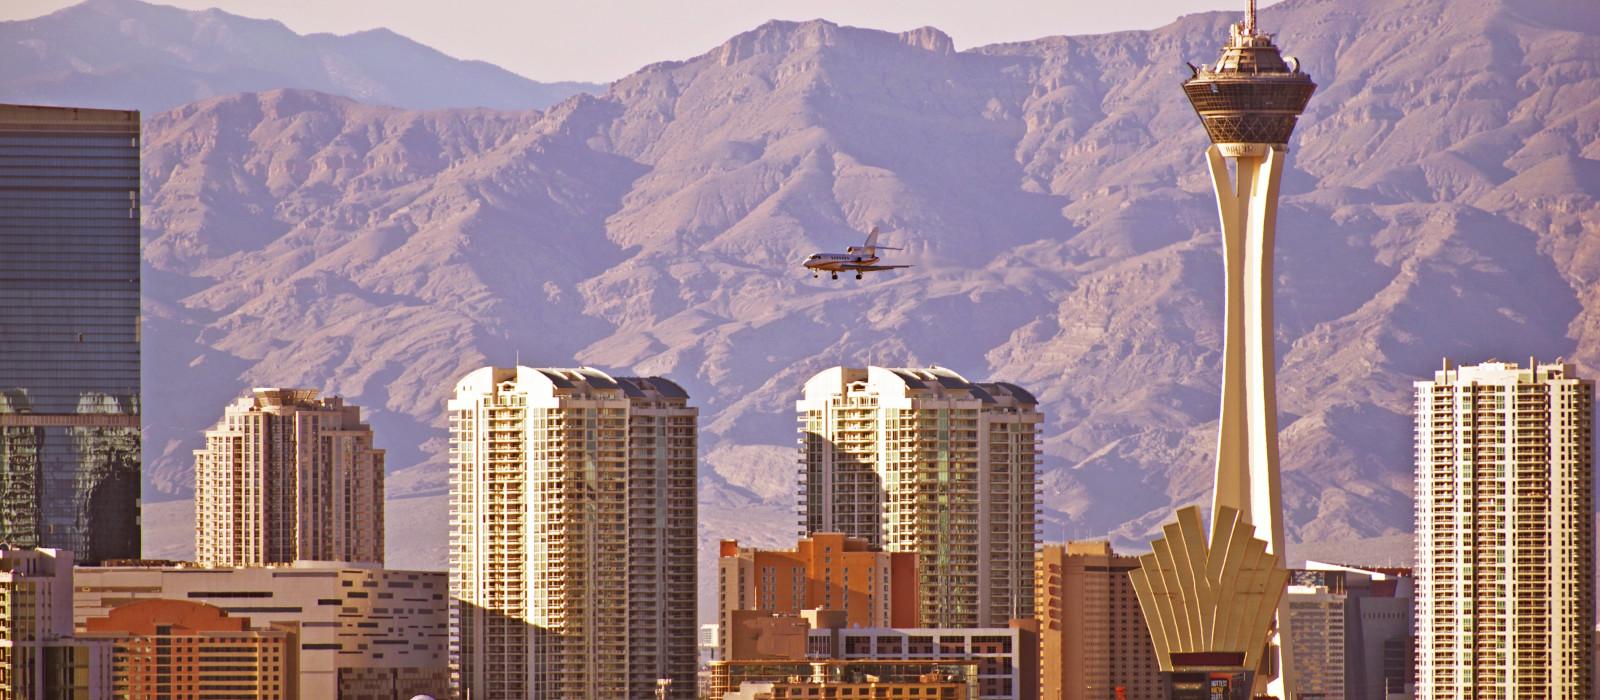 Reiseziel Las Vegas USA